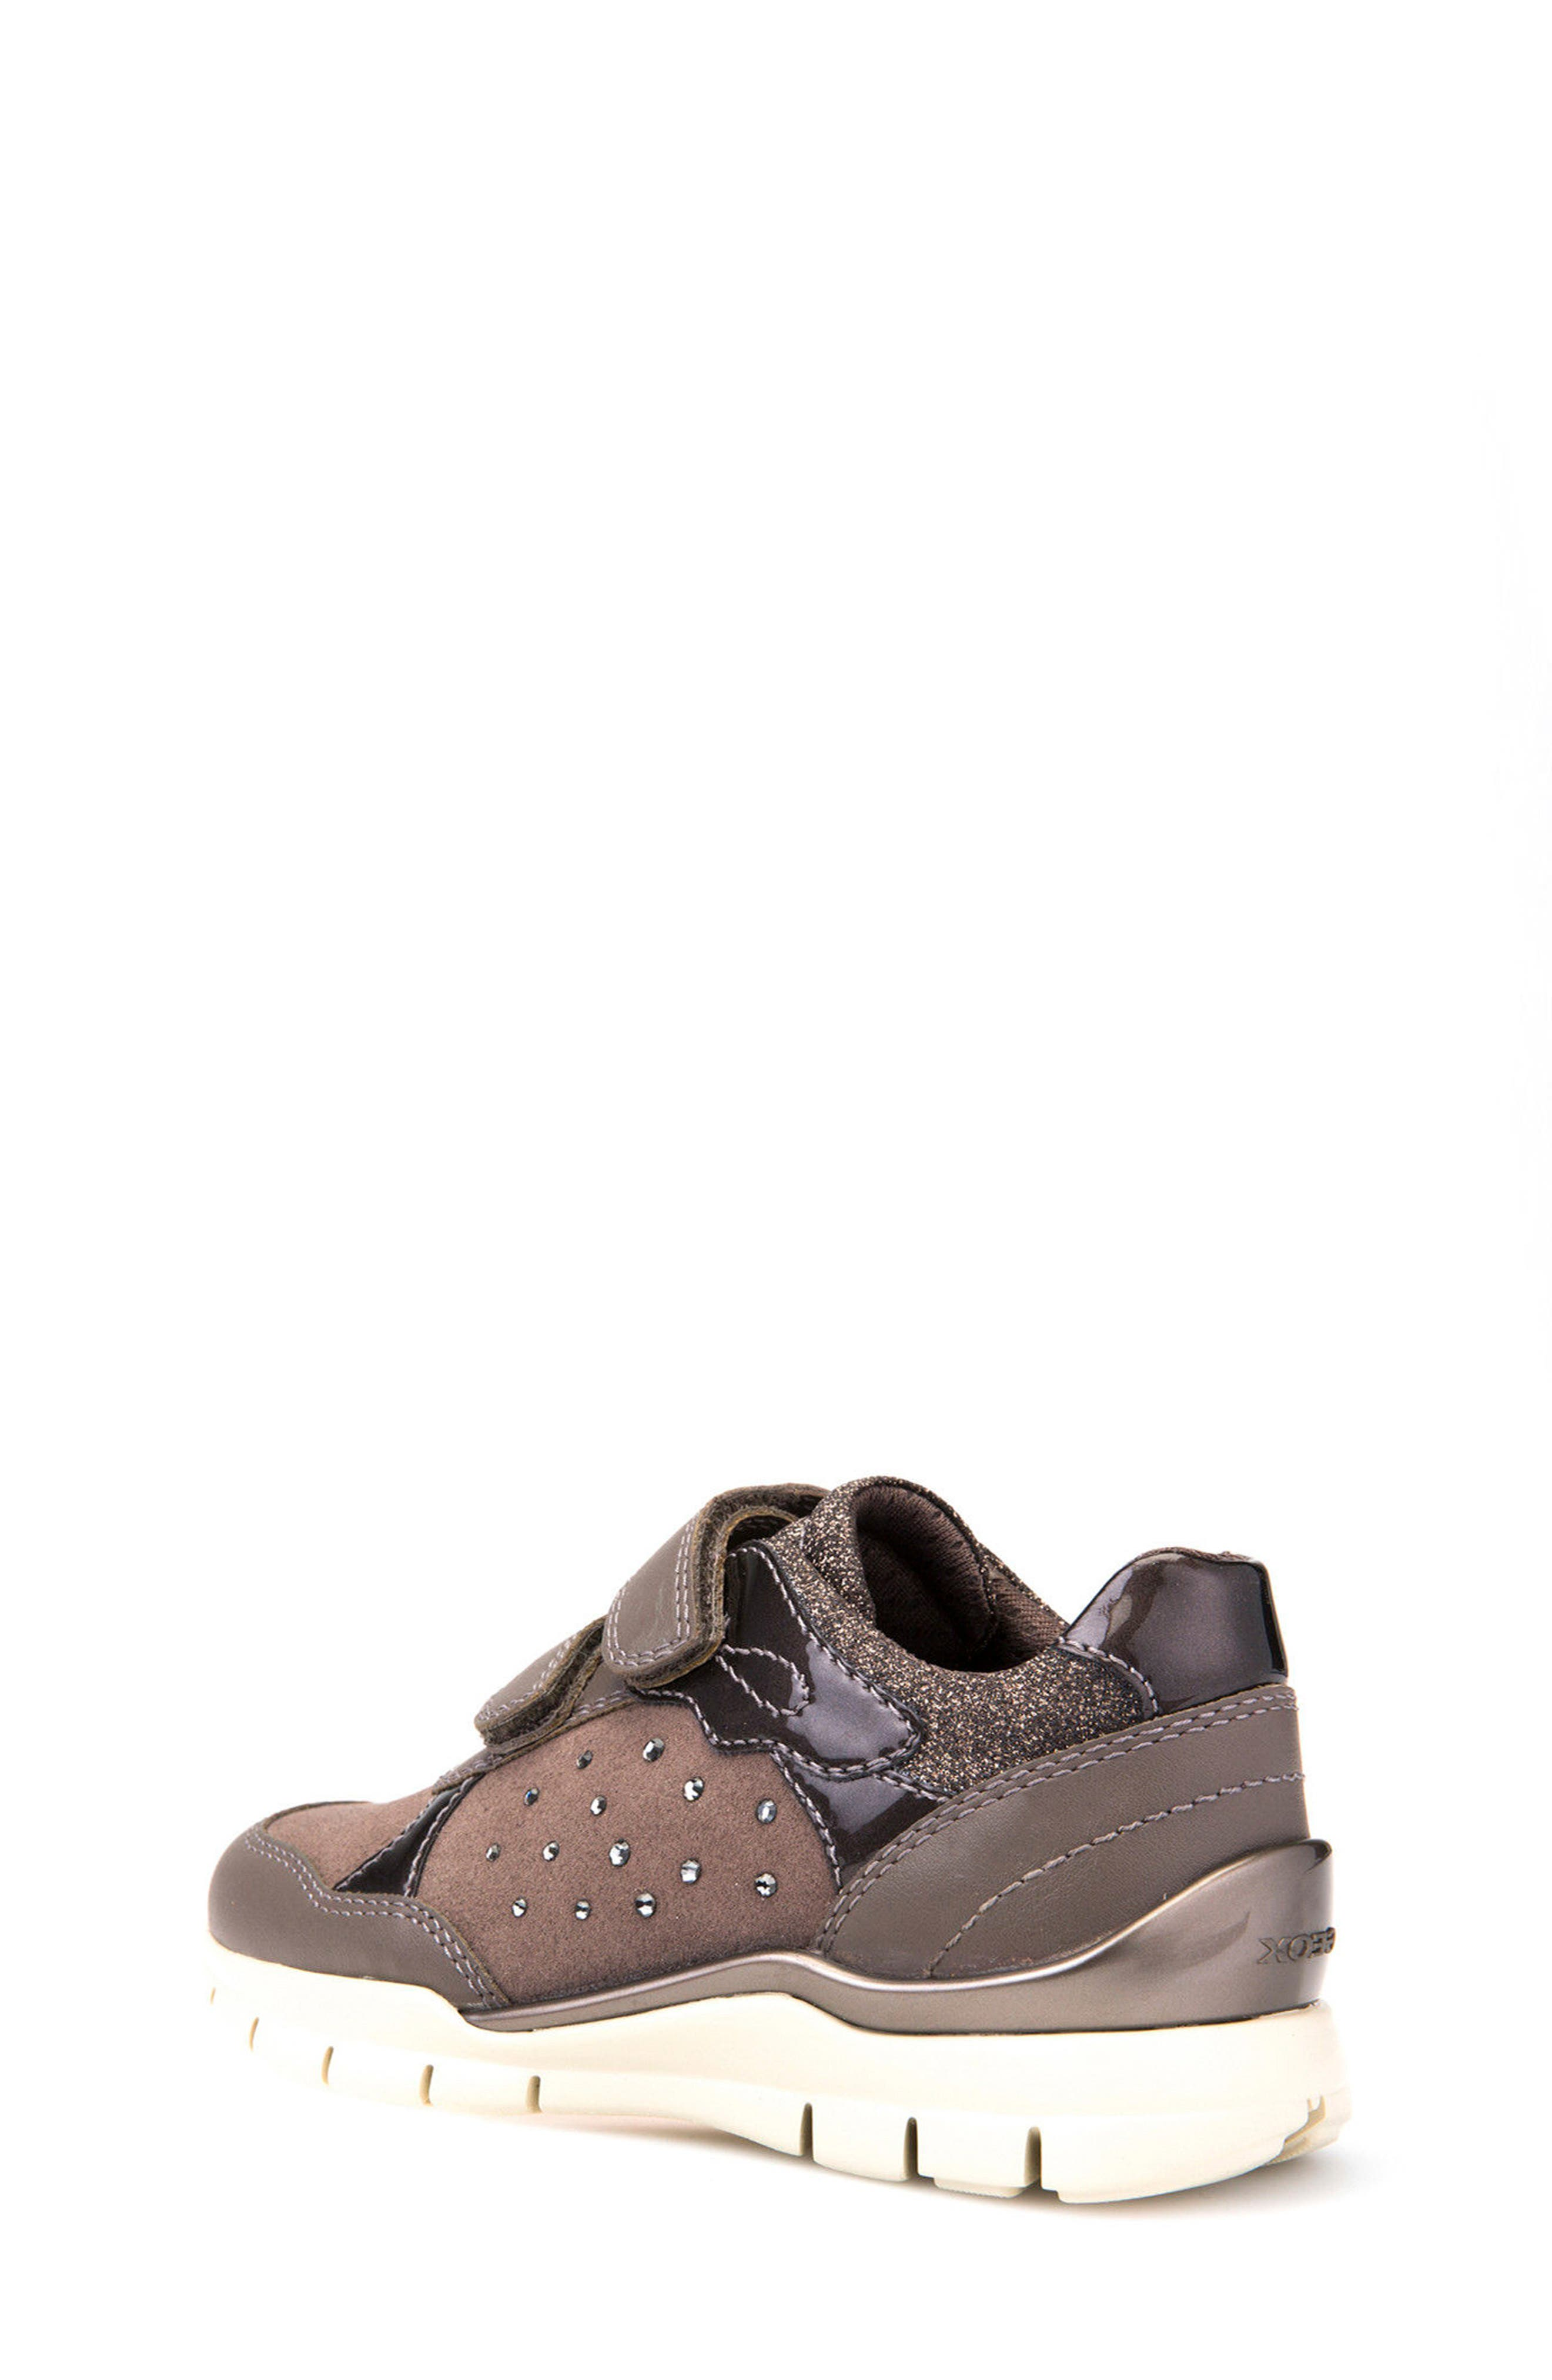 Sukie Sneaker,                             Alternate thumbnail 2, color,                             200